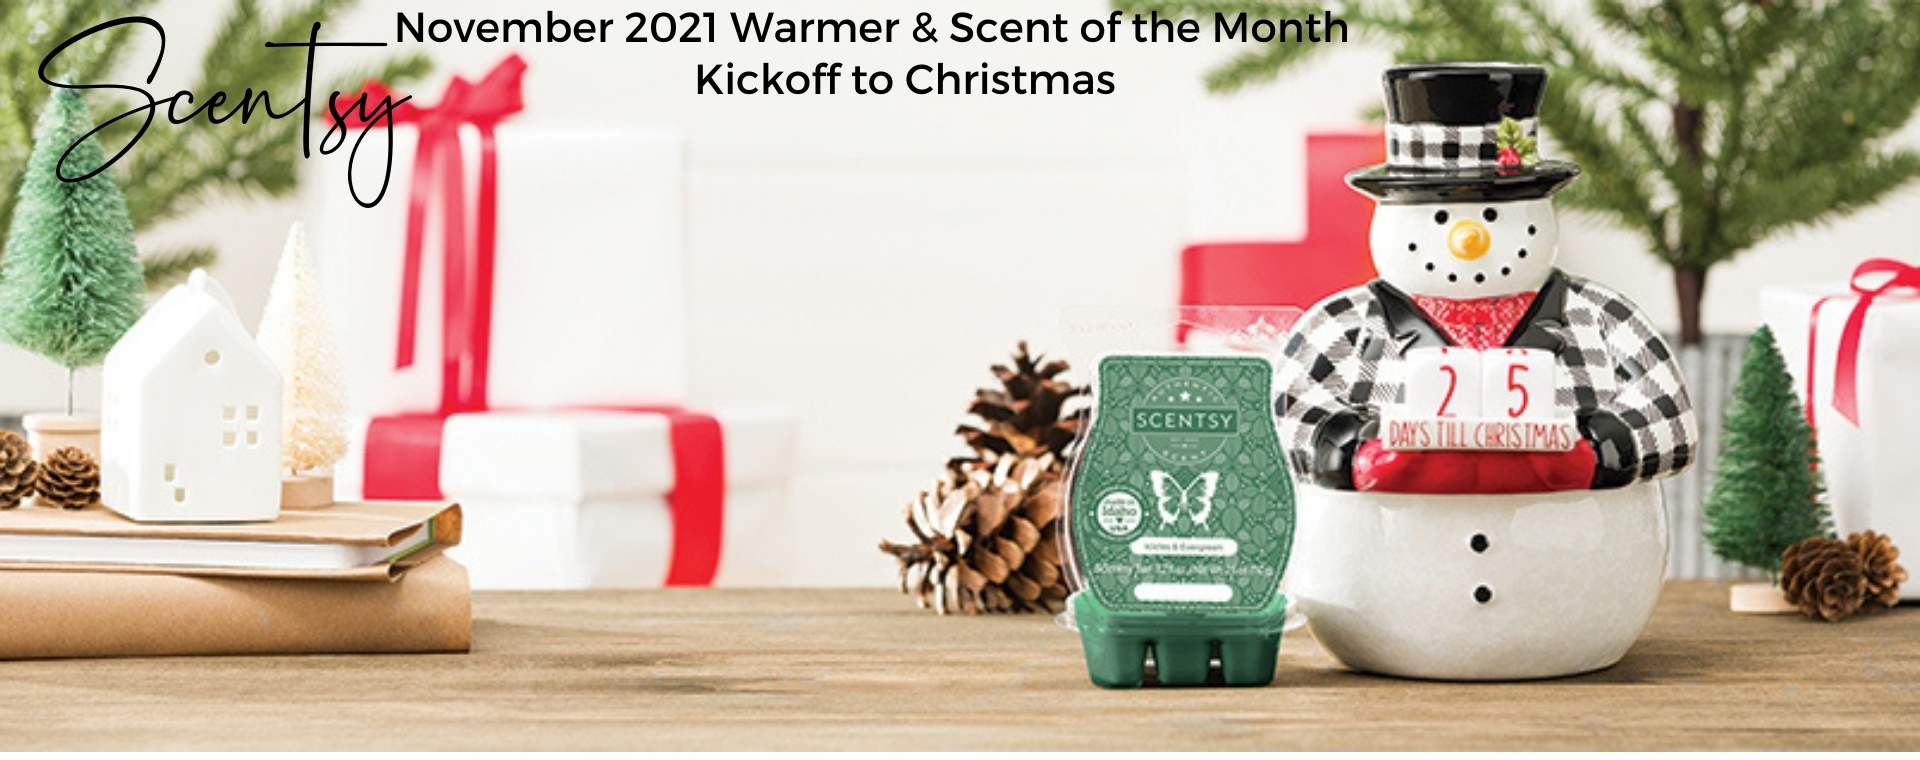 Scentsy November 2021 Kickoff to Christmas